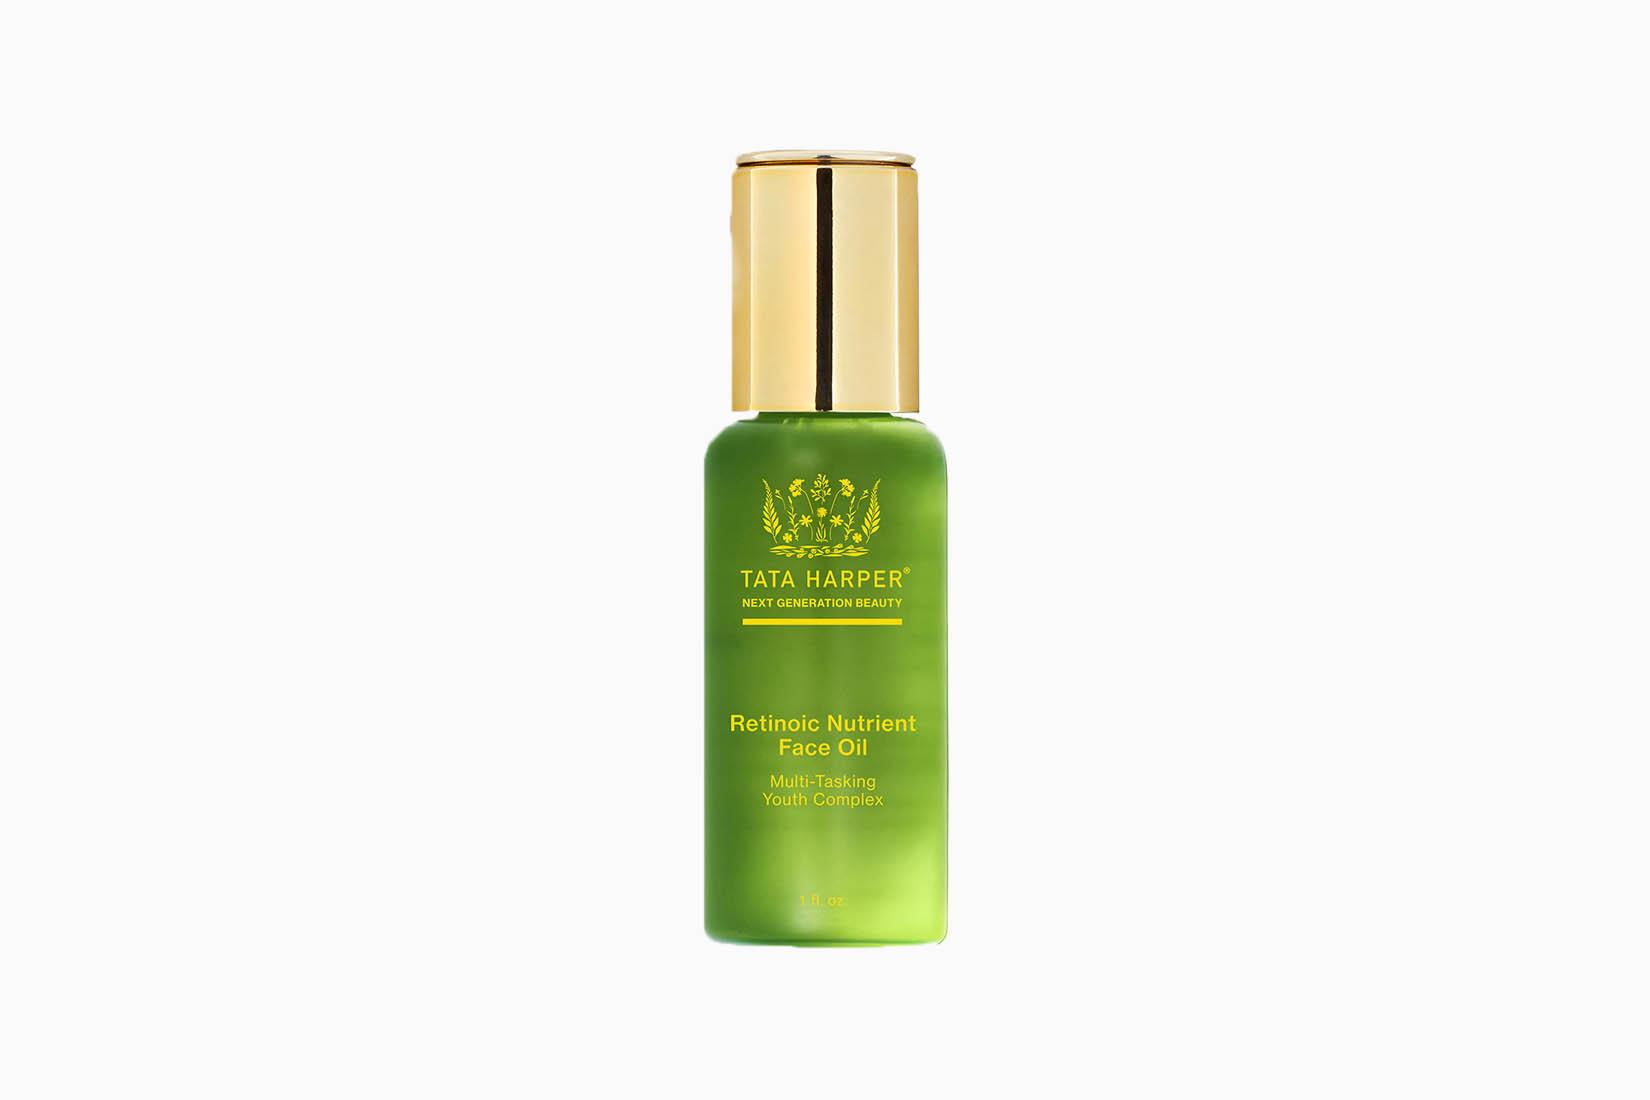 Best Face Oils Tata Harper Review - Luxe Digital